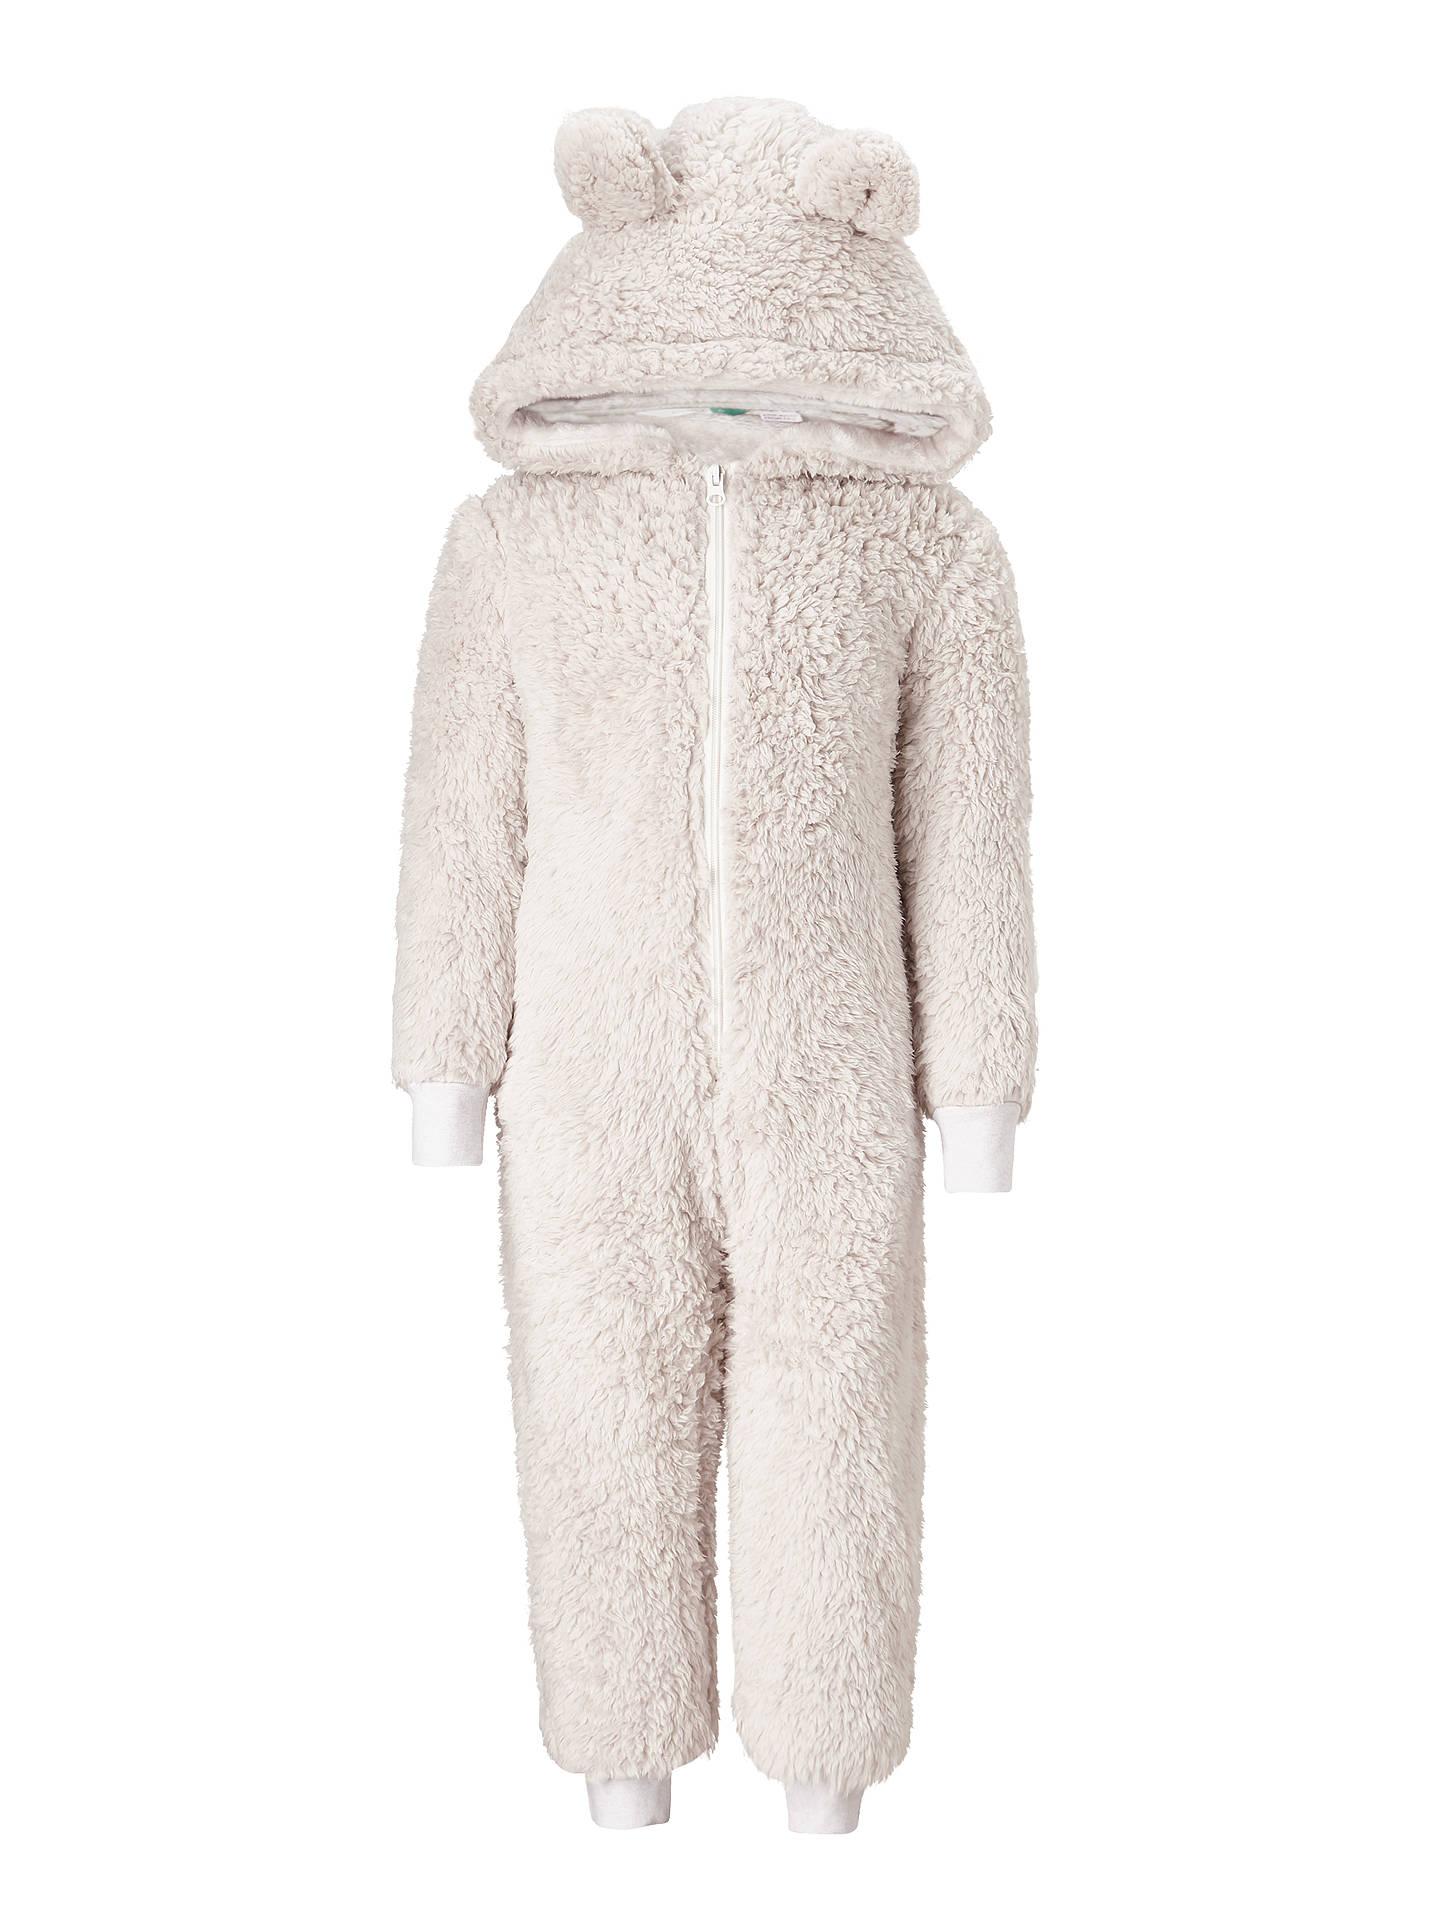 63bfc4922 Buy John Lewis Children's Fleece Bear Onesie, Beige, 3 years Online at  johnlewis.